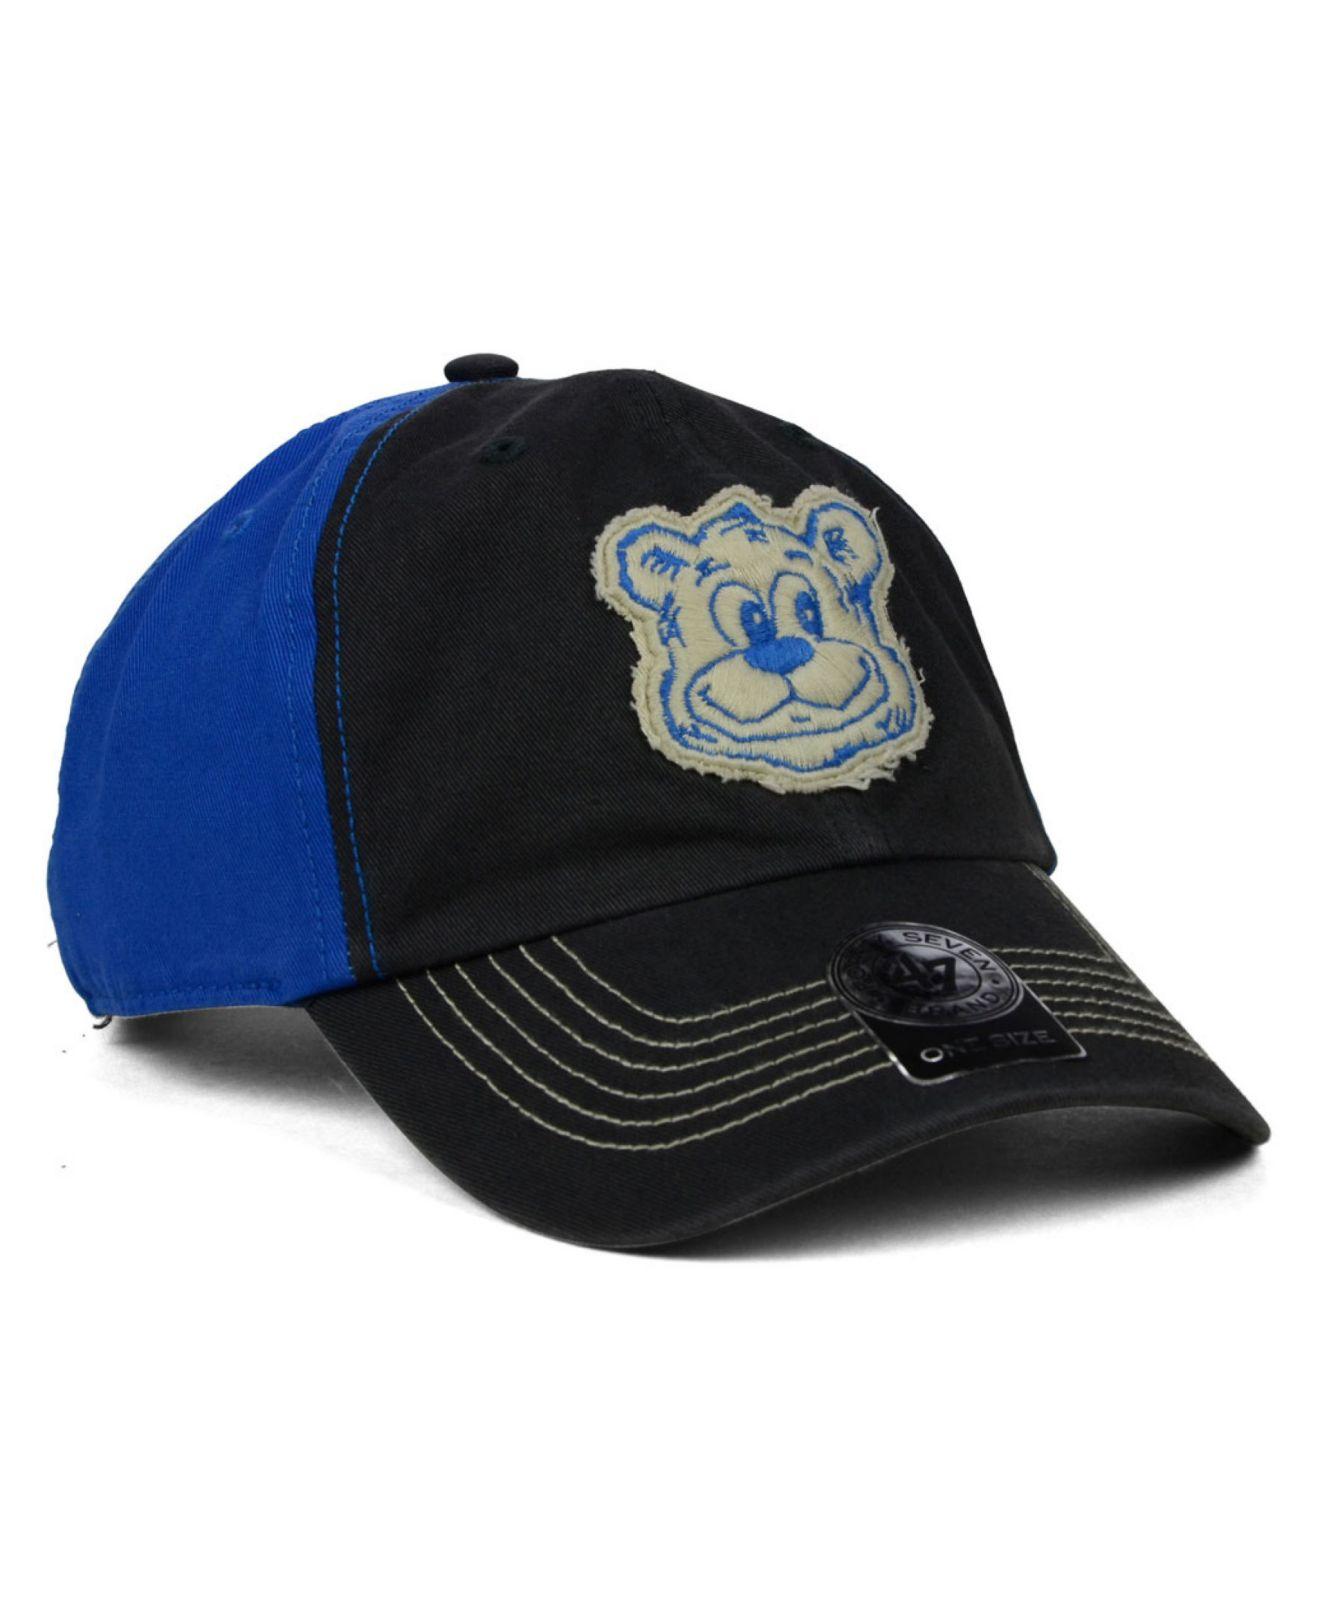 10b3802221435 ... inexpensive 47 brand ucla bruins clean up cap in blue for men lyst  28cb5 e11c1